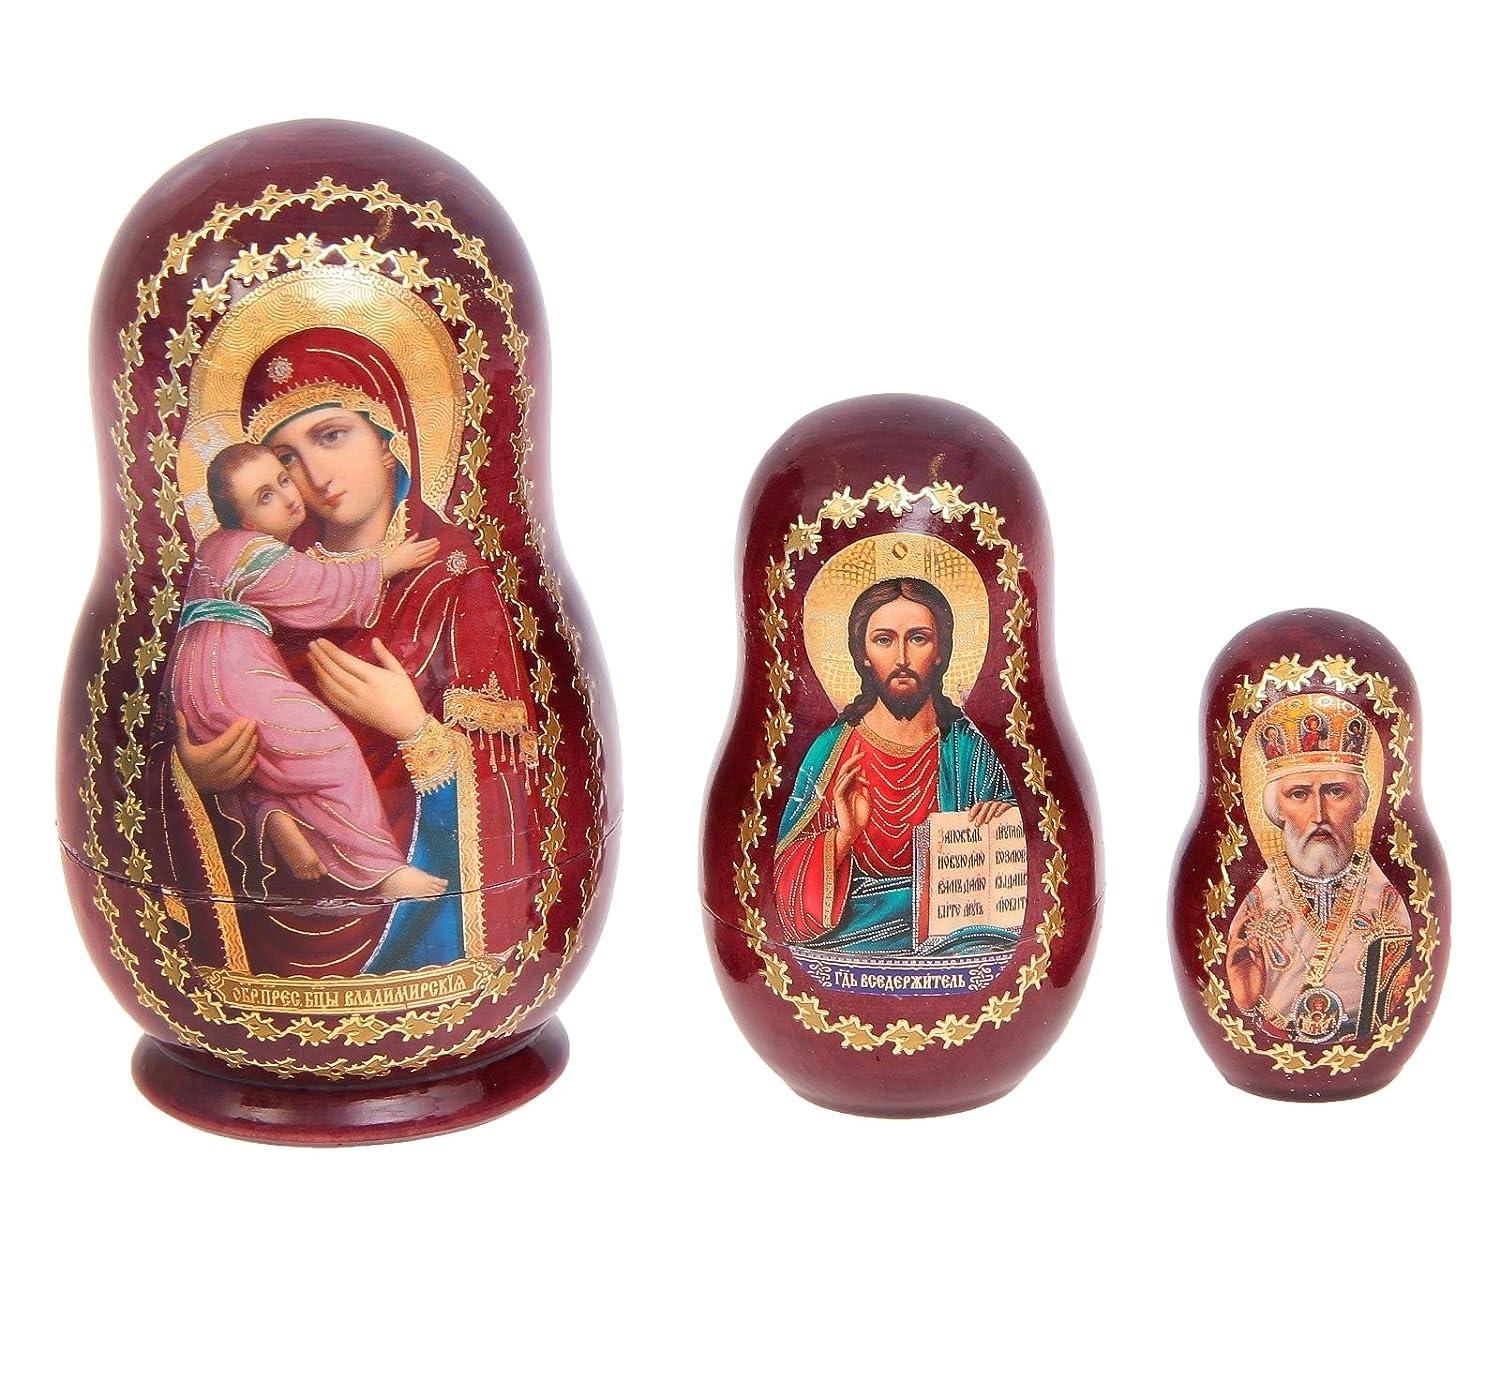 3,9 Set of 3 Wooden Russian Icon Nesting Dolls Matryoshka Stacking Nested Wood Dolls